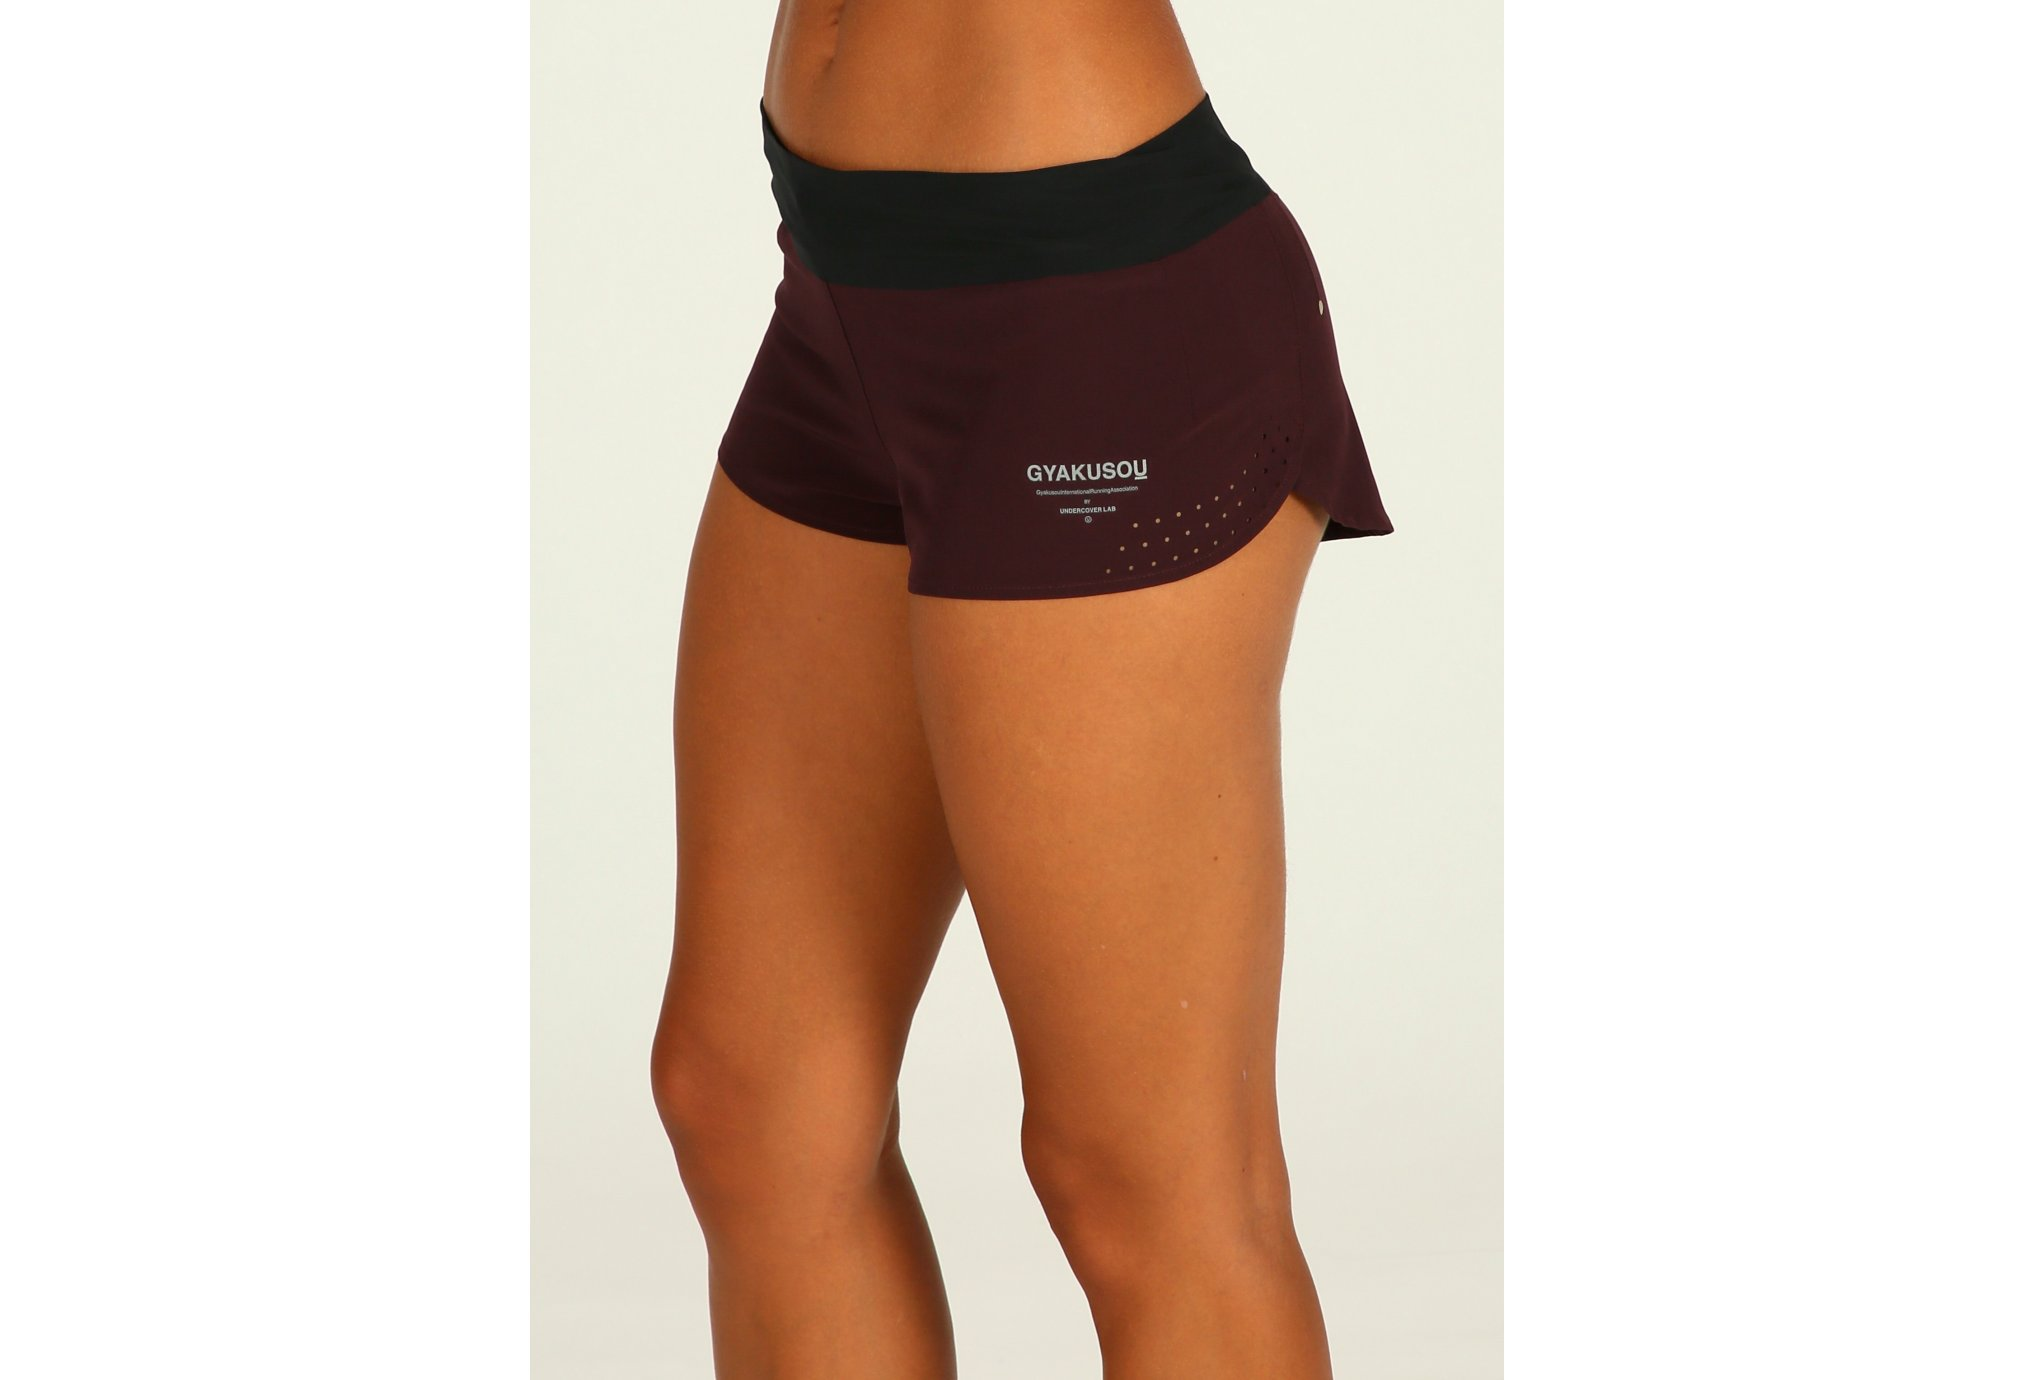 Nike X Gyakusou Short Raceday W Diététique Vêtements femme